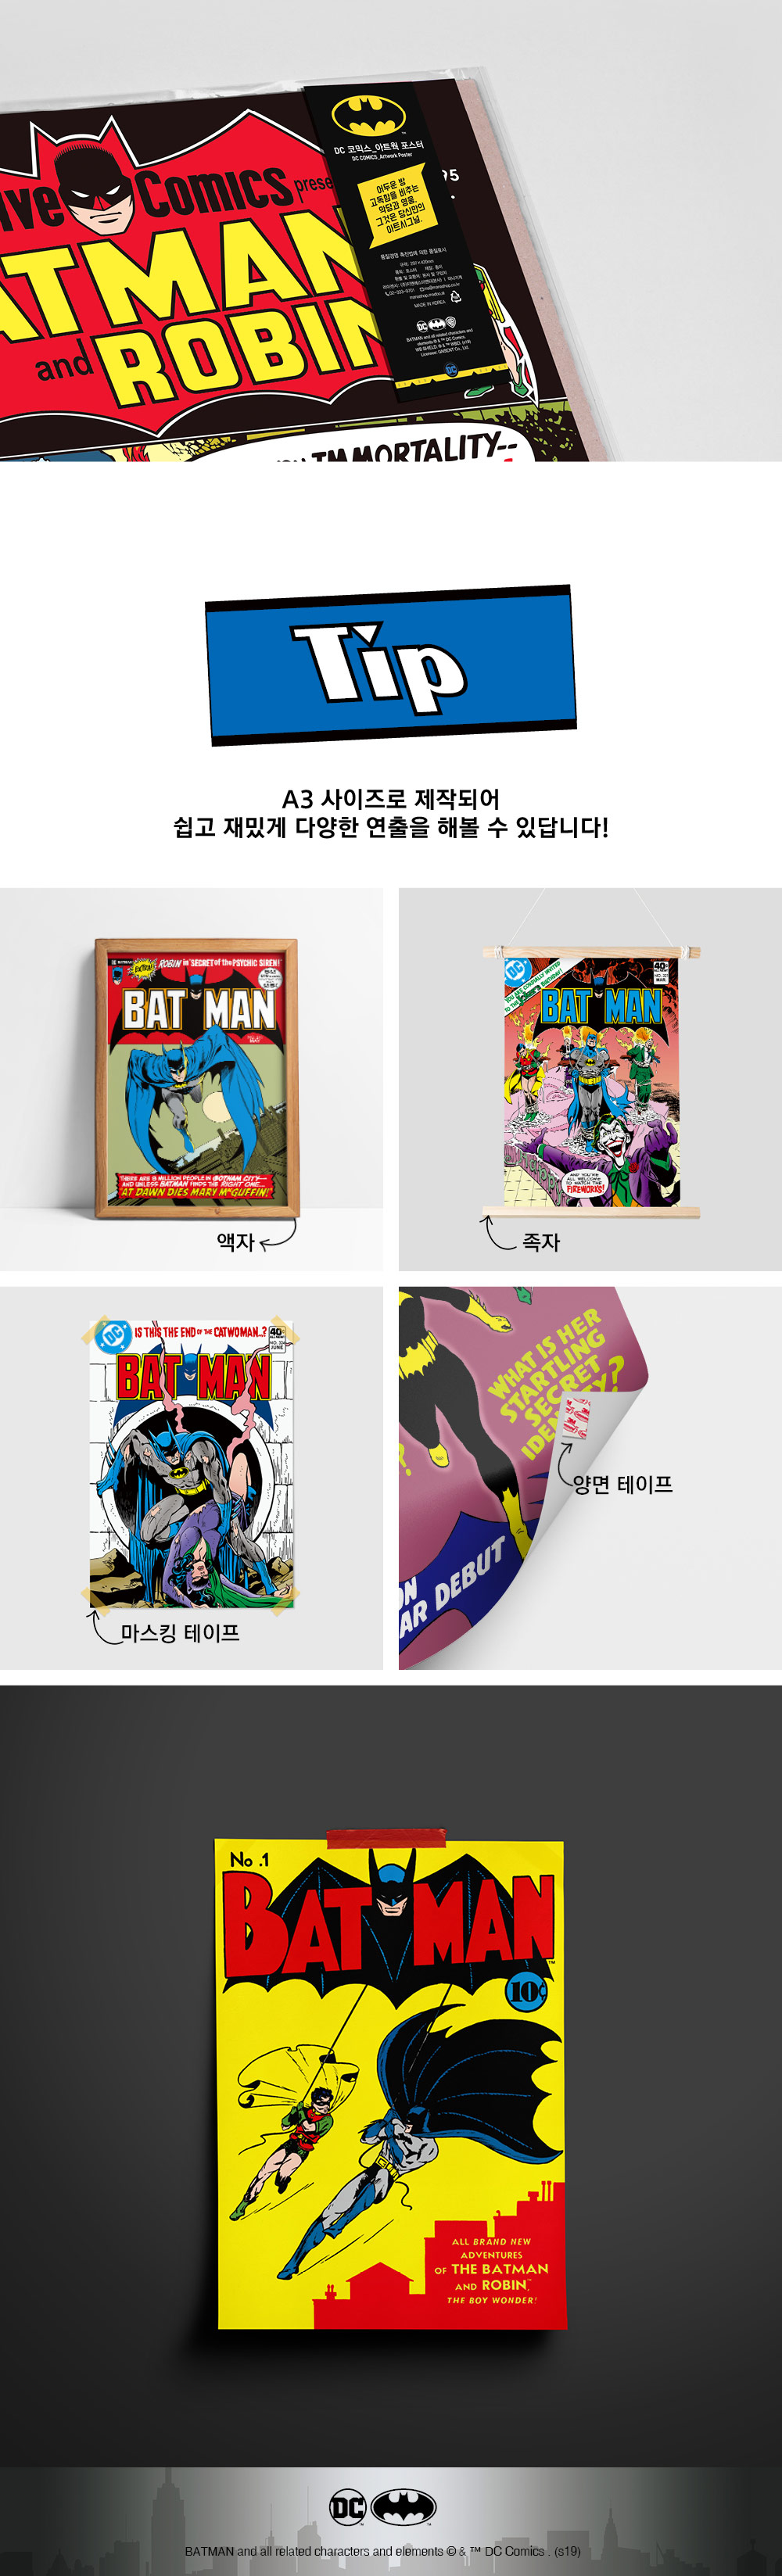 DC코믹스 인테리어 포스터_배트맨_06.jpg